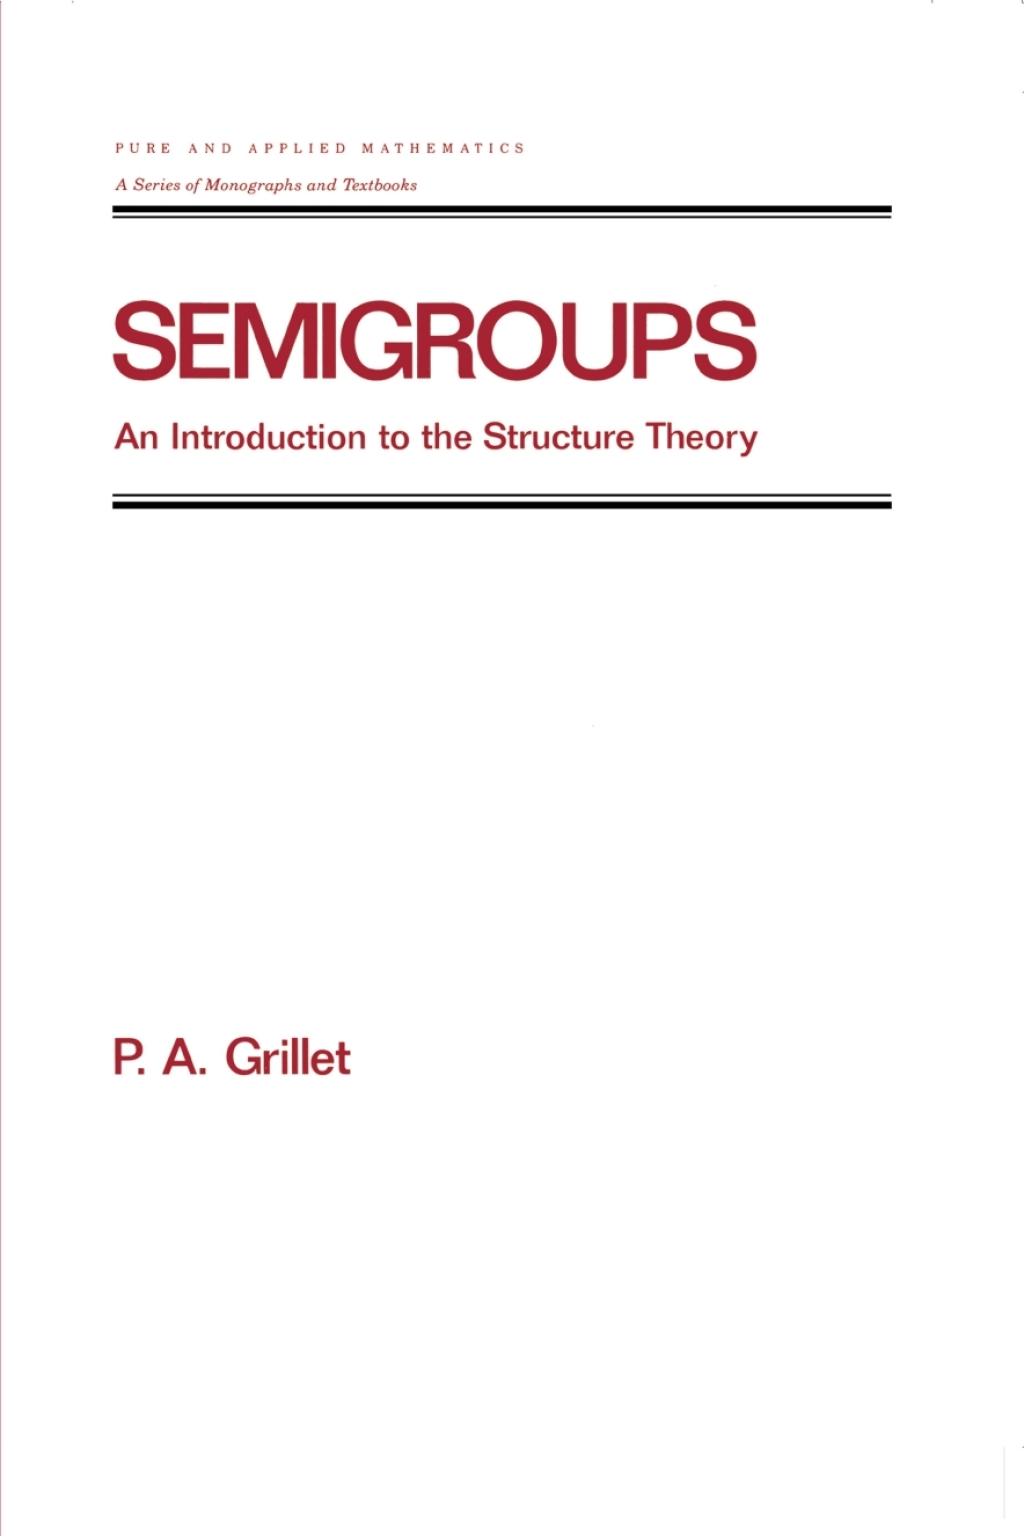 Semigroups (eBook Rental)